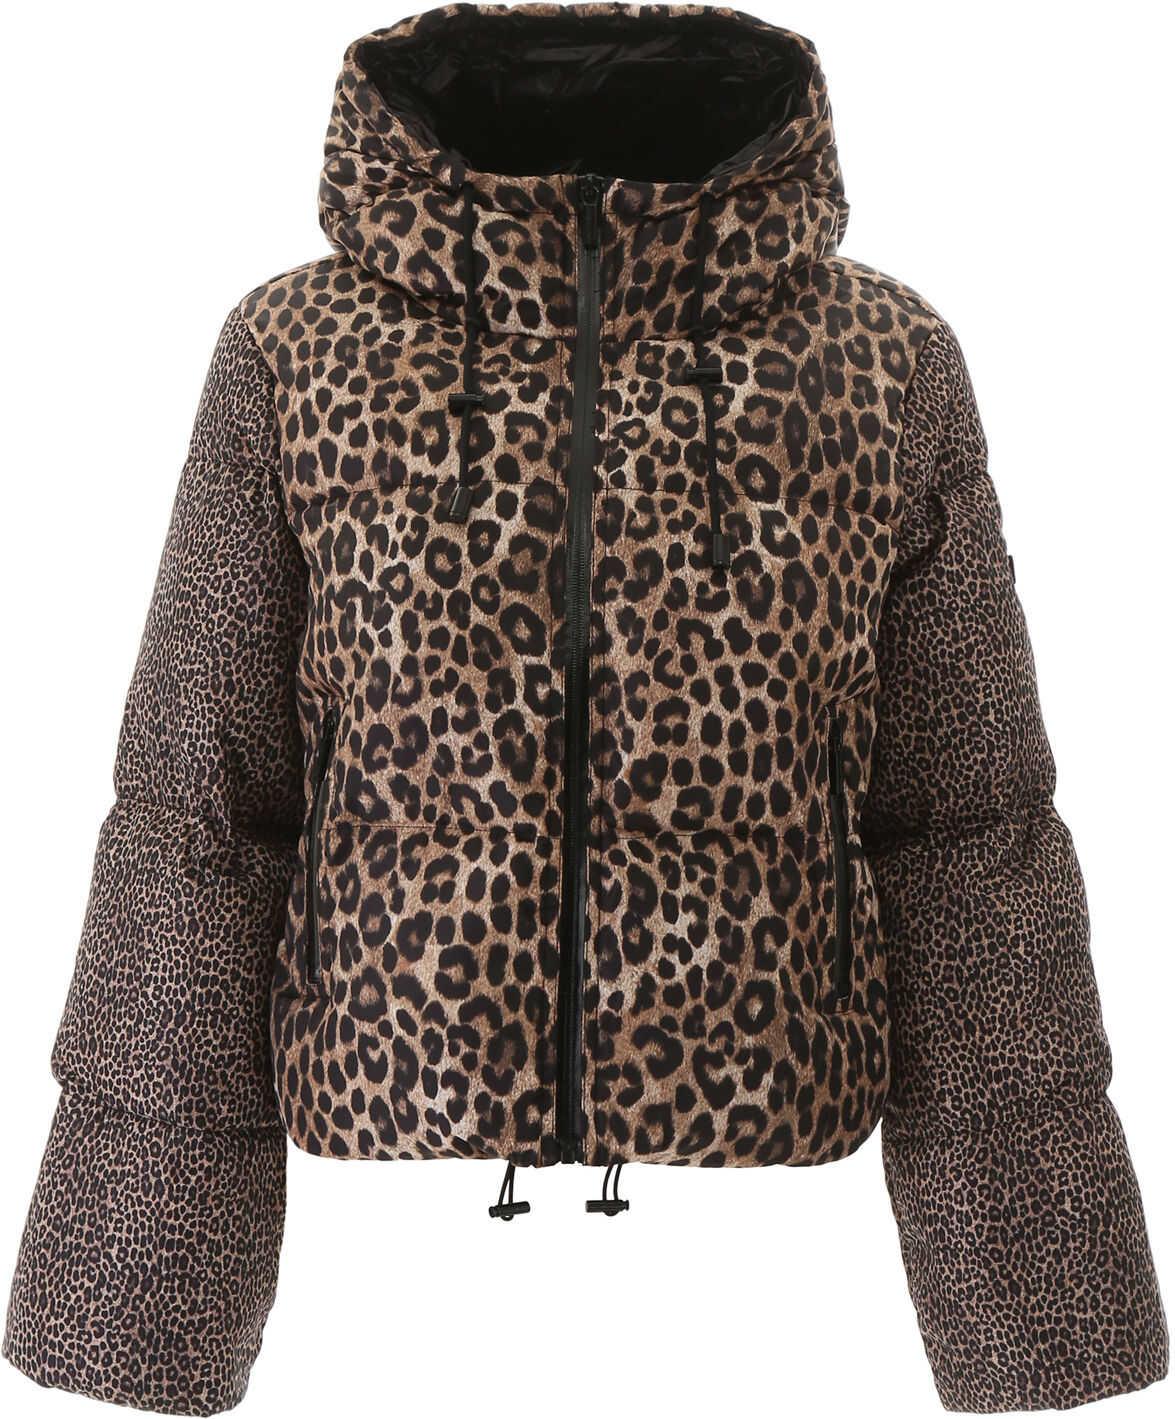 Michael Kors Animalier Puffer Jacket DARK CAMEL